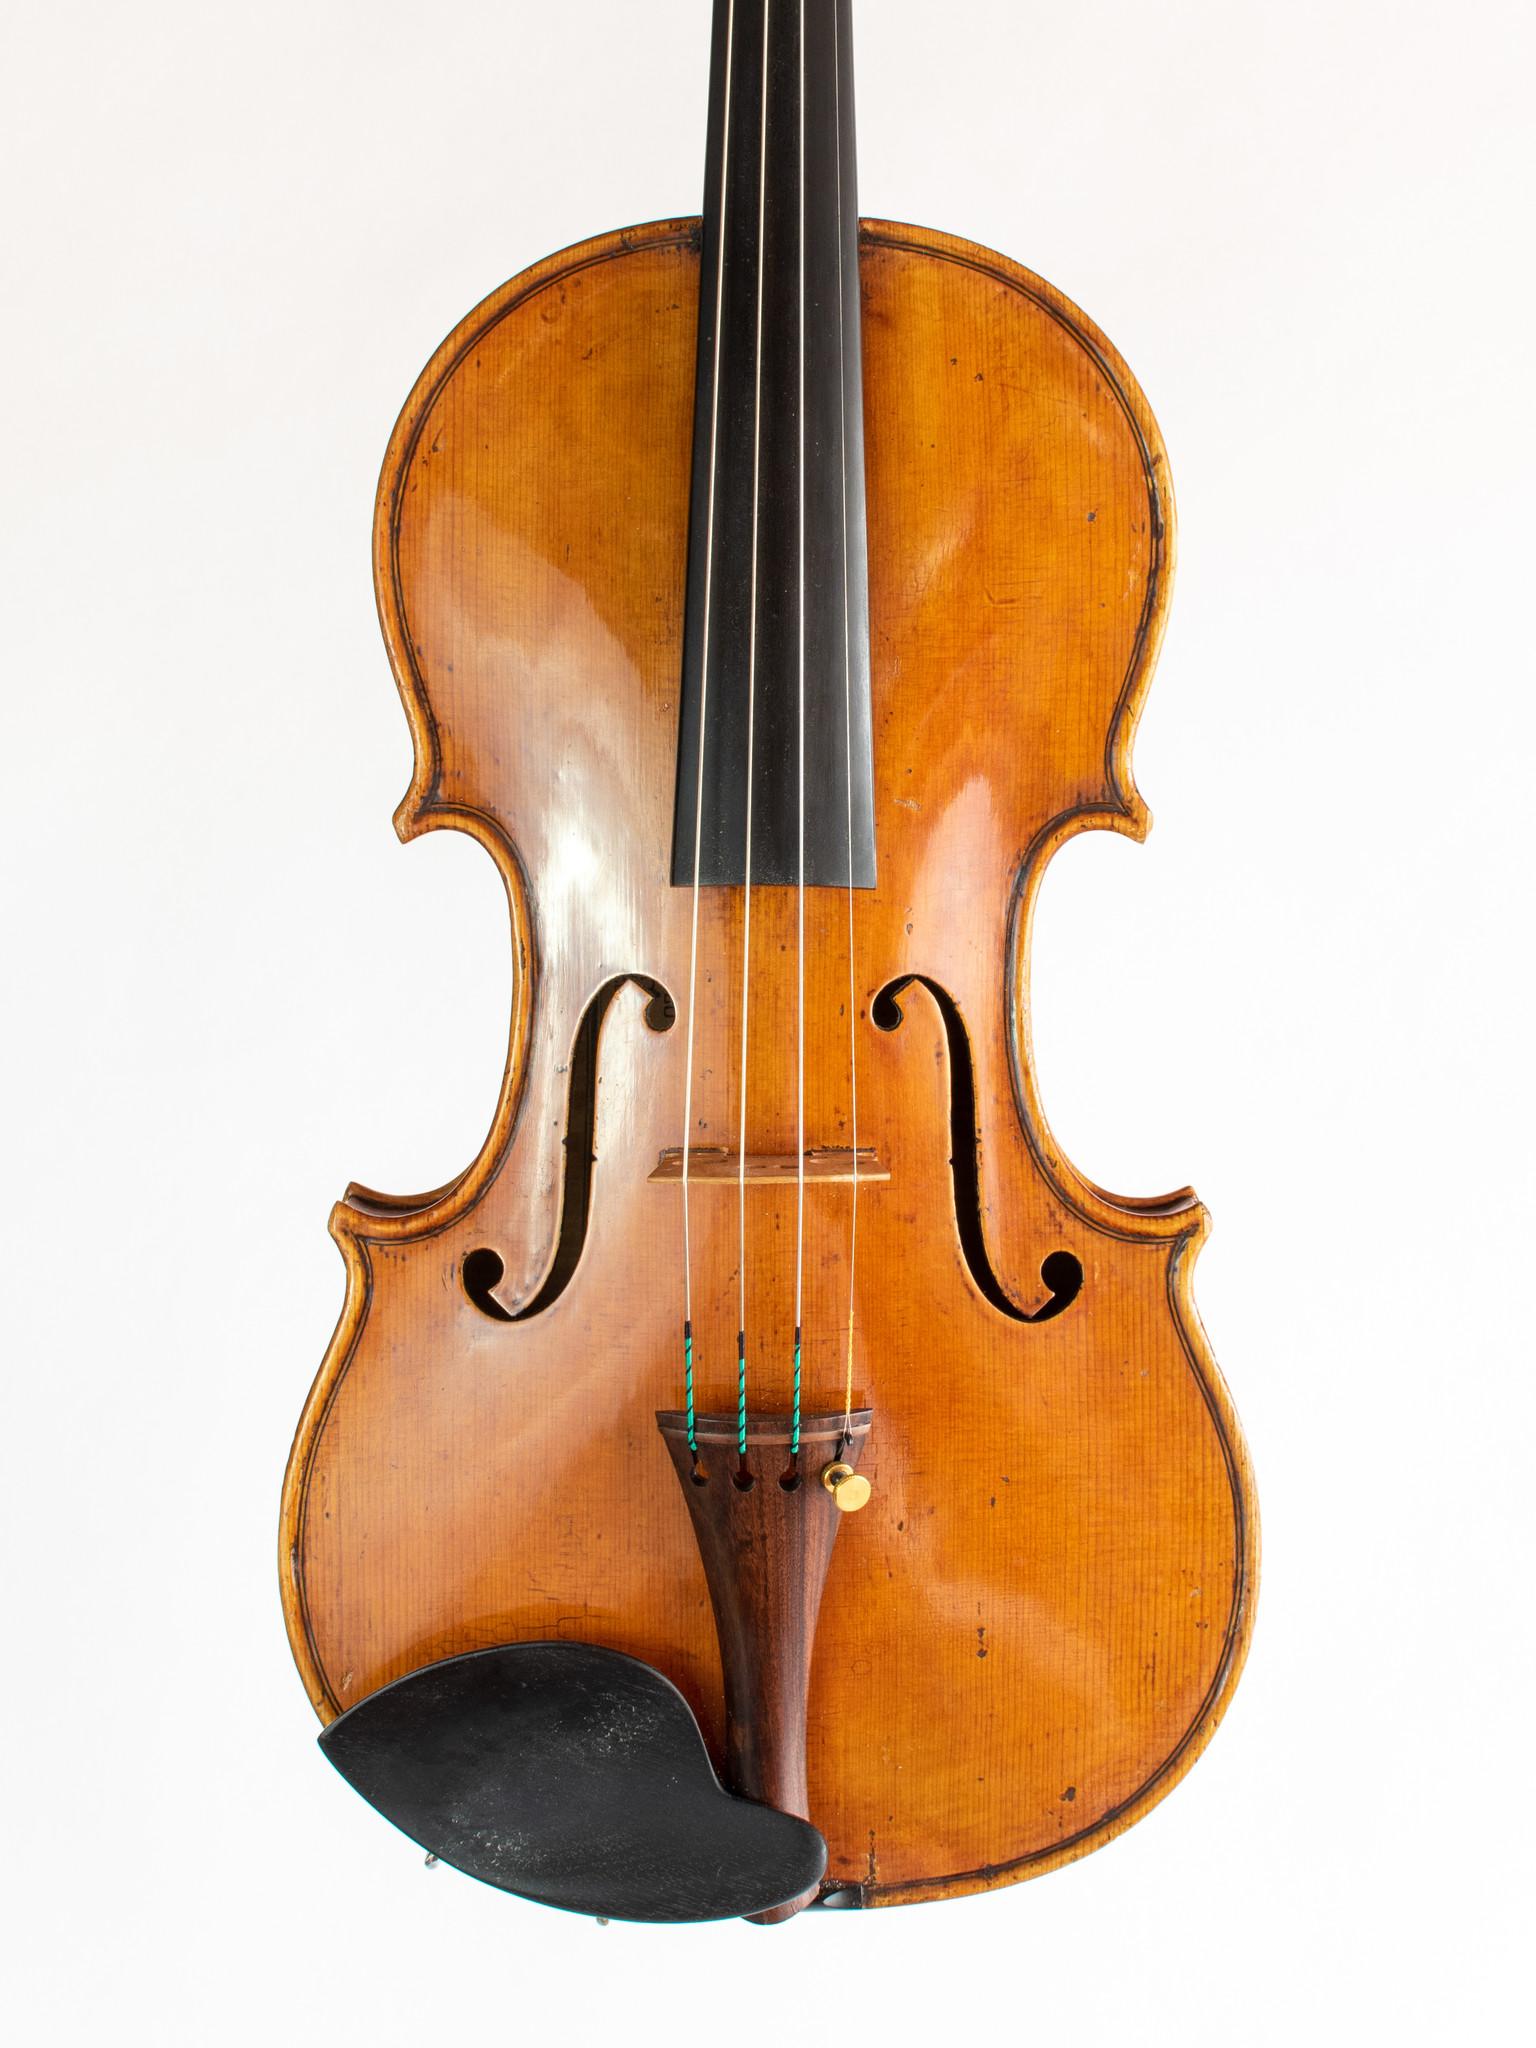 Italian Paolo de Barbieri violin, Genoa, 1929